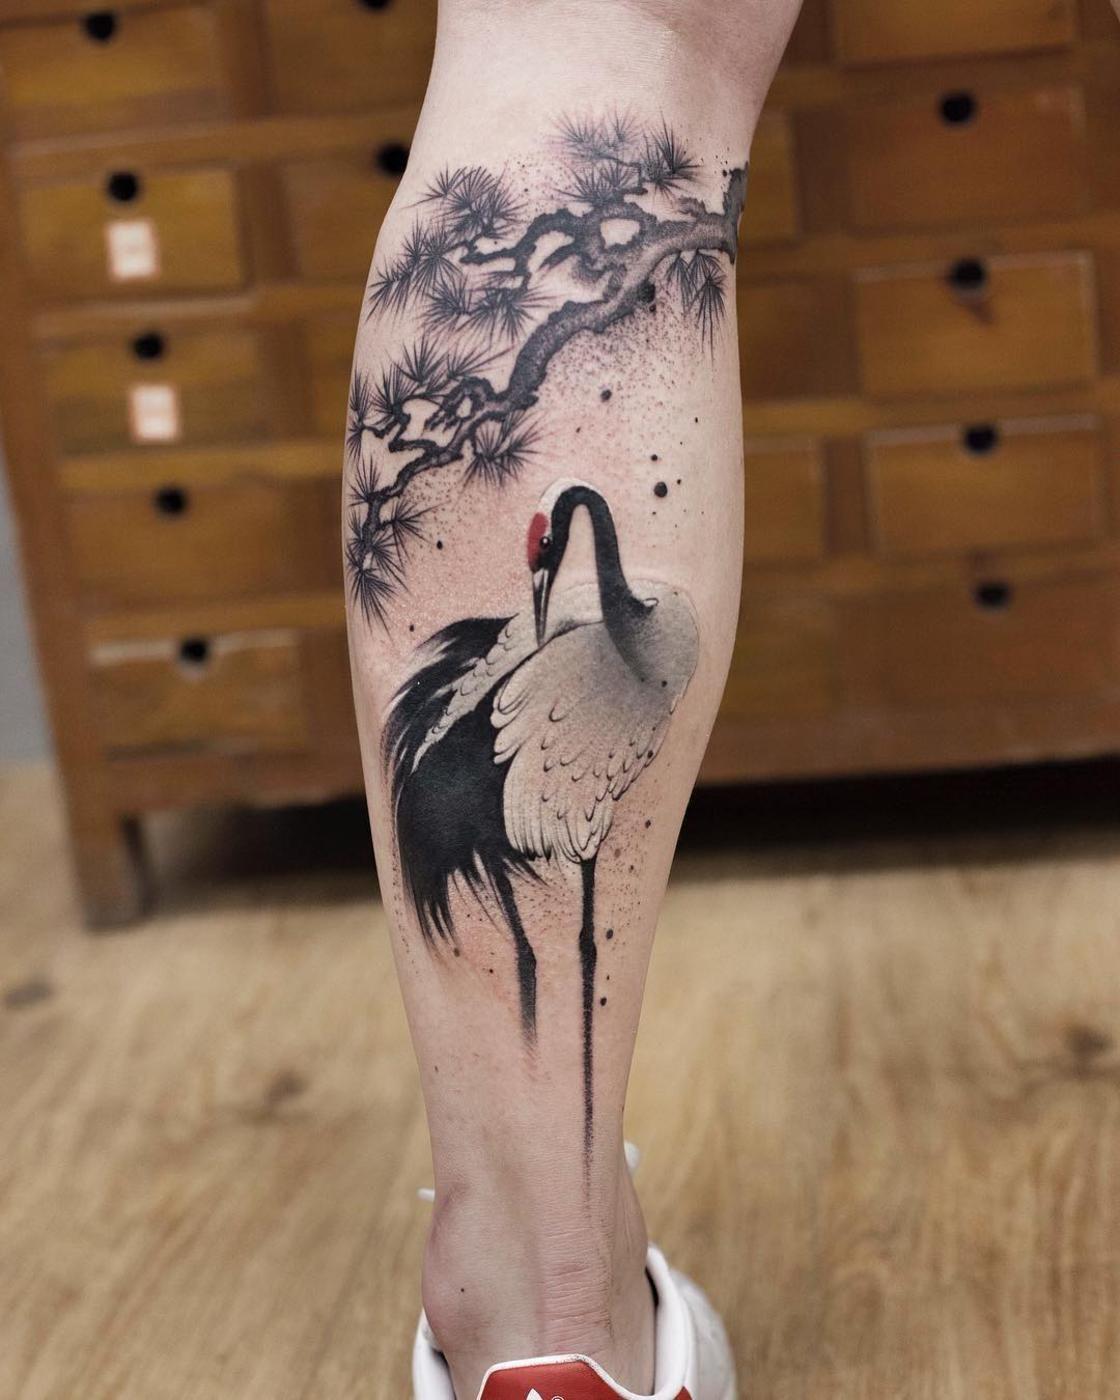 Tatuaje de una avestruz en la pierna